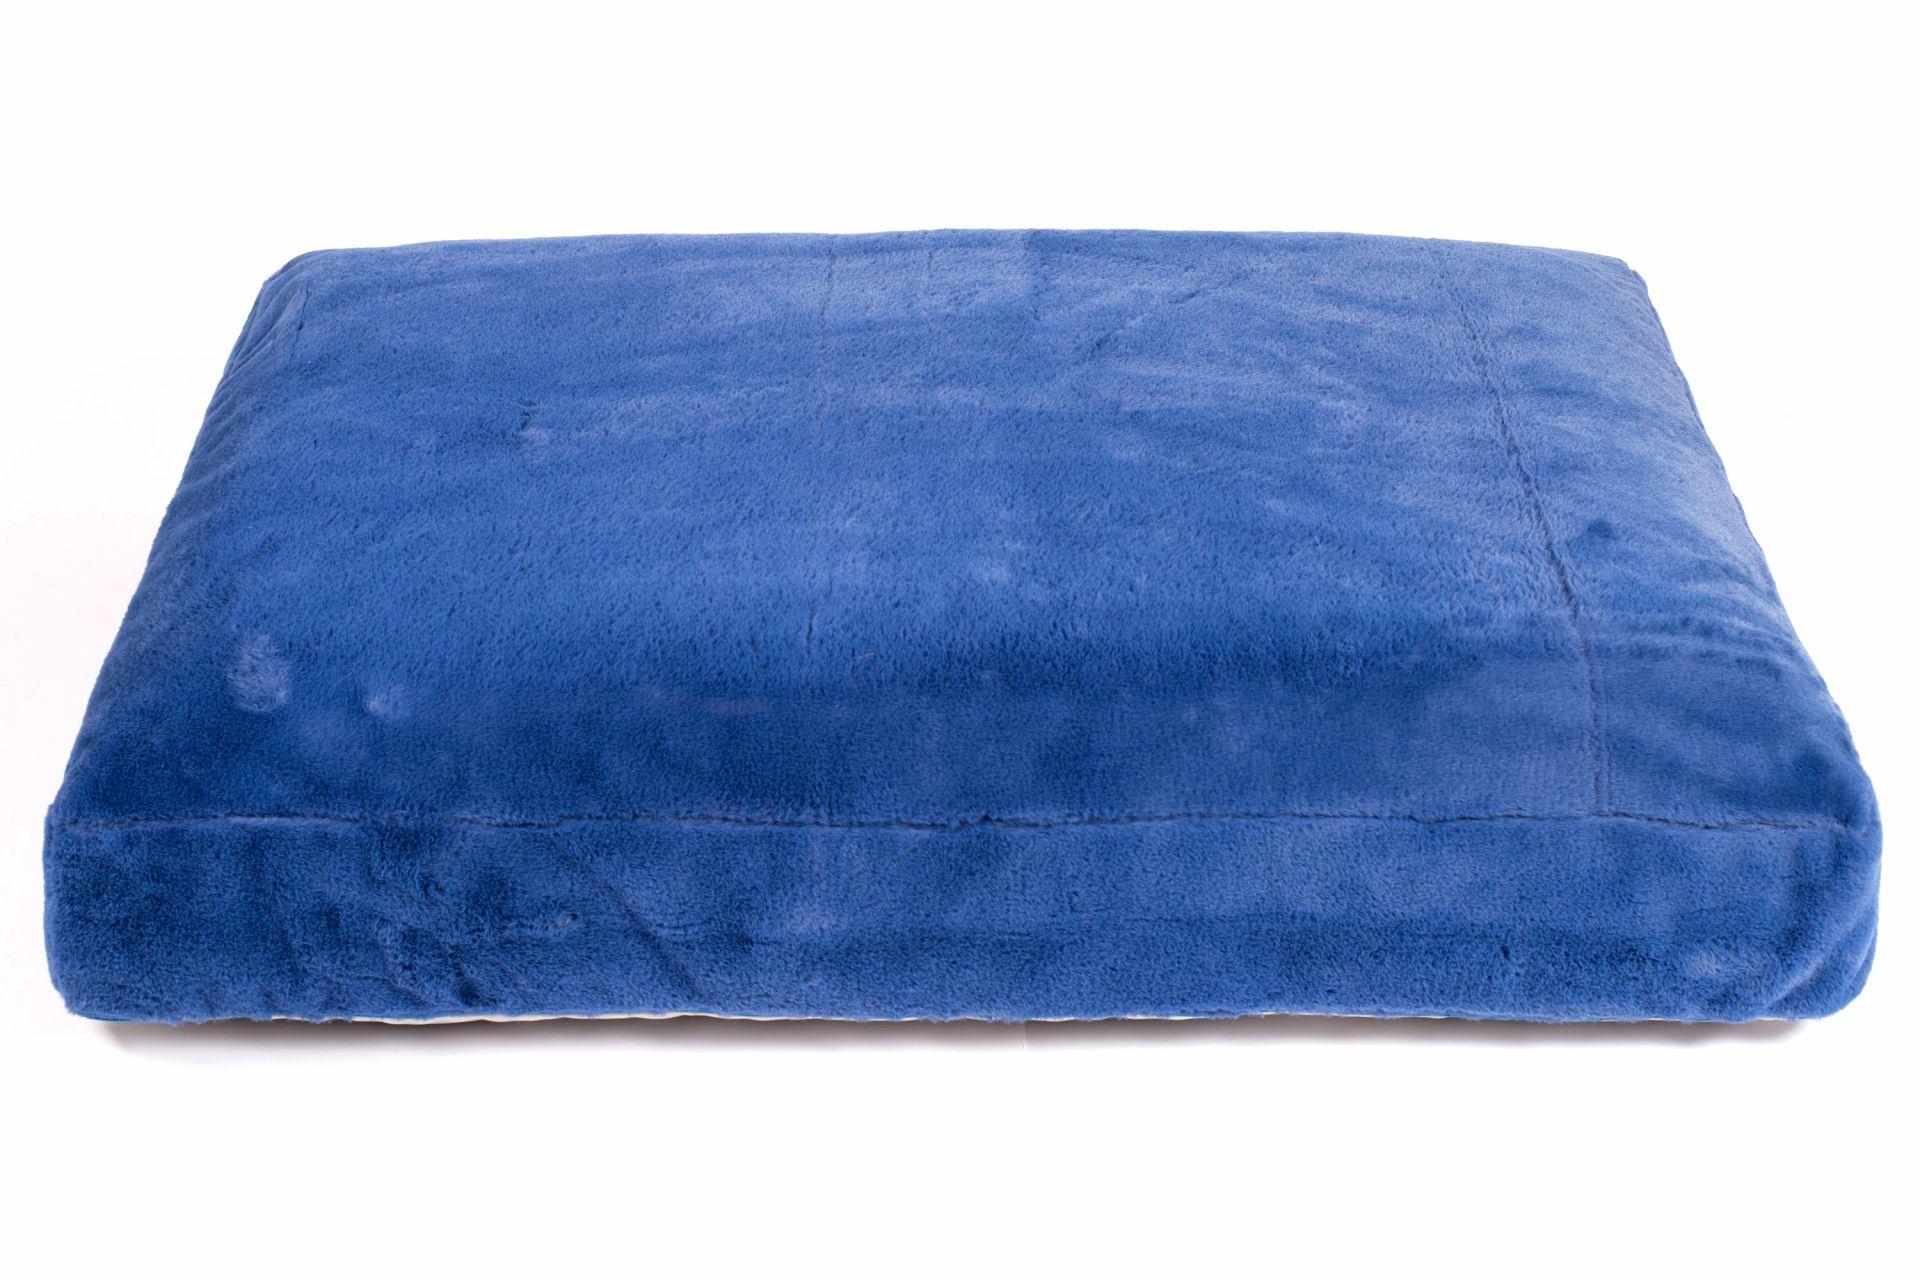 Wau-Sleep Blue